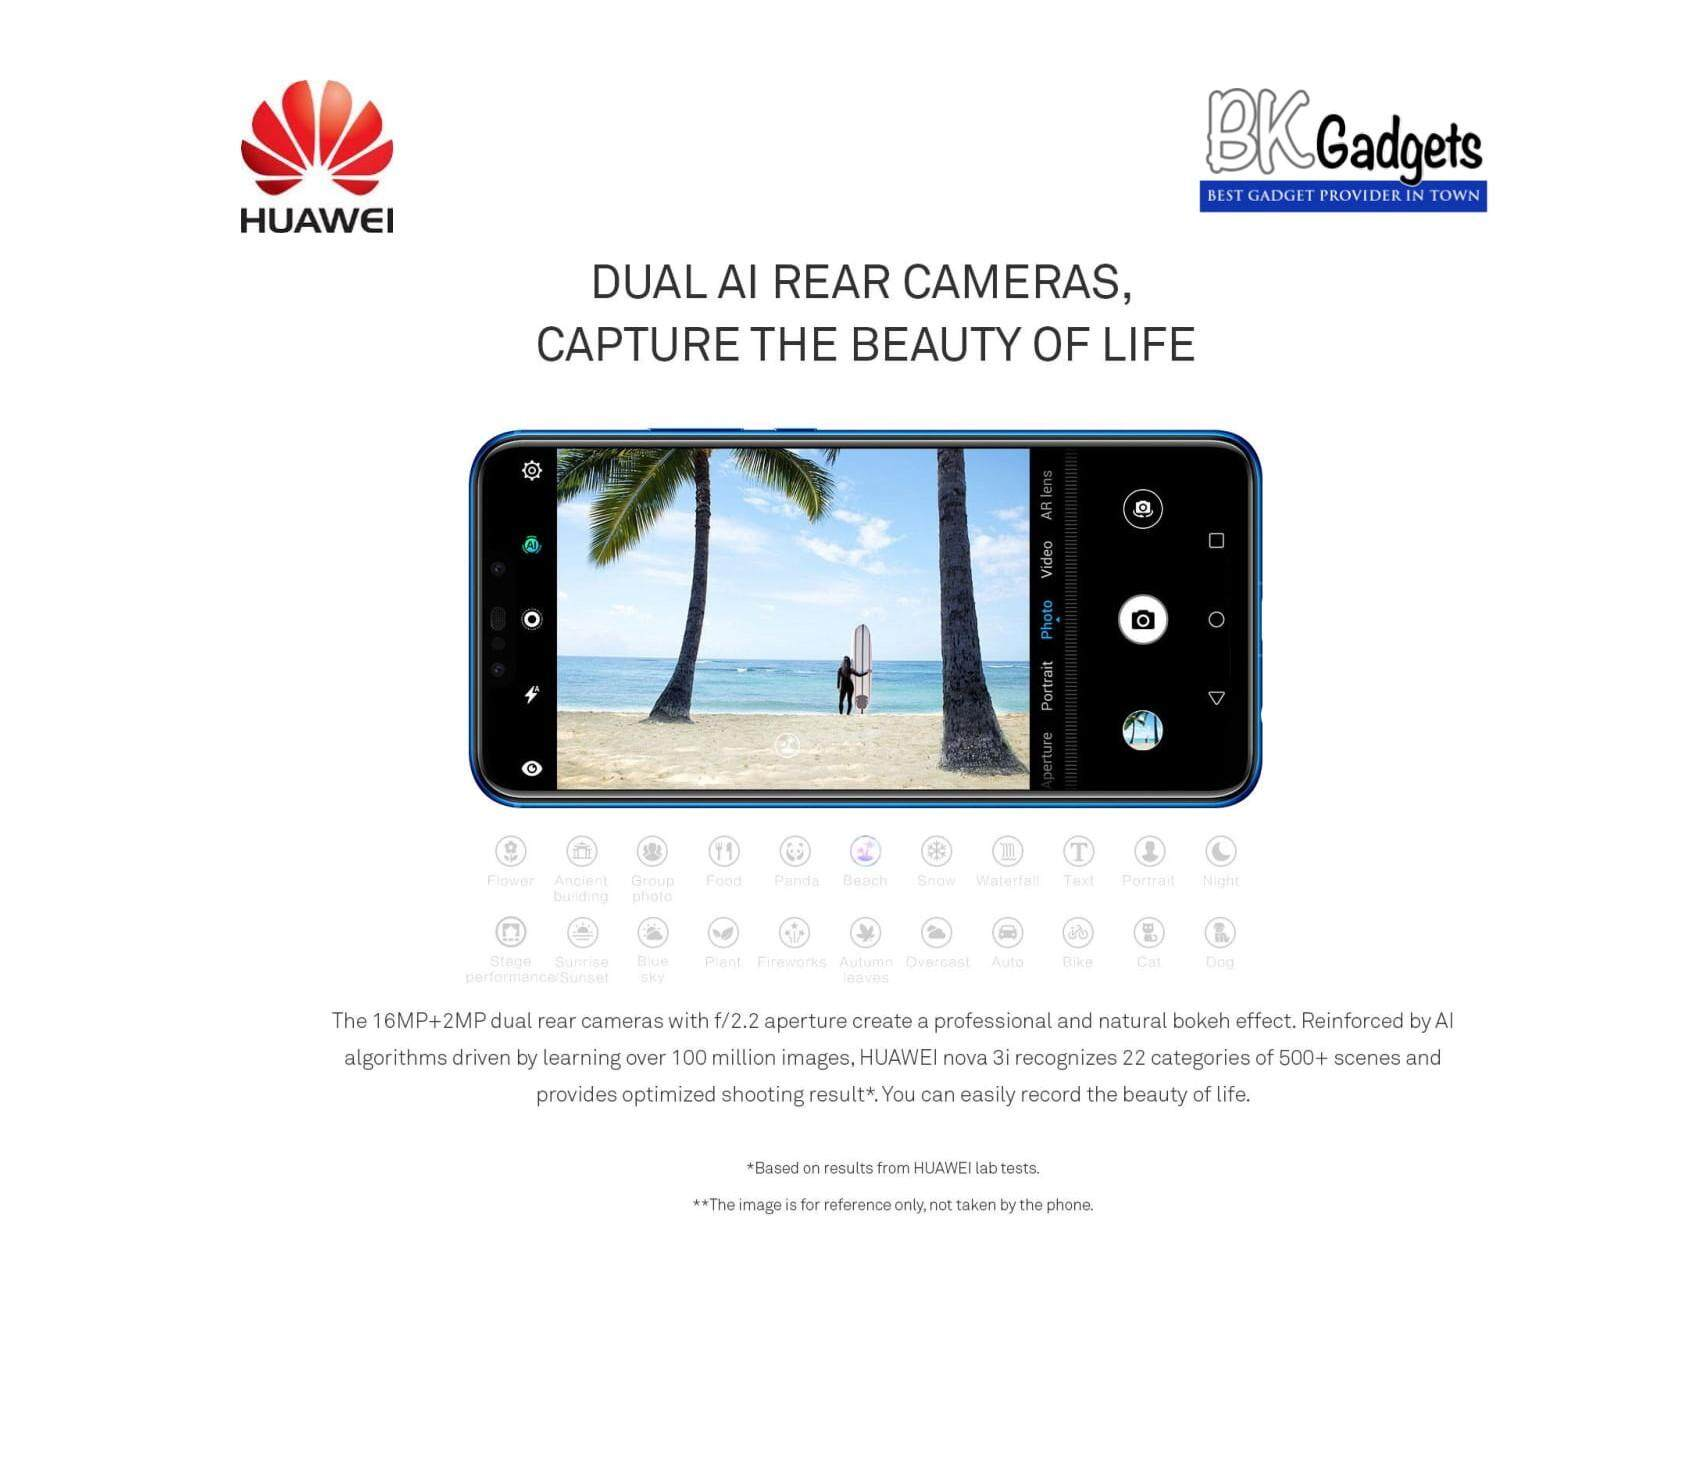 Huawei Nova 3i 4/128GB Purple - Original from Huawei Malaysia 1 Year Warranty